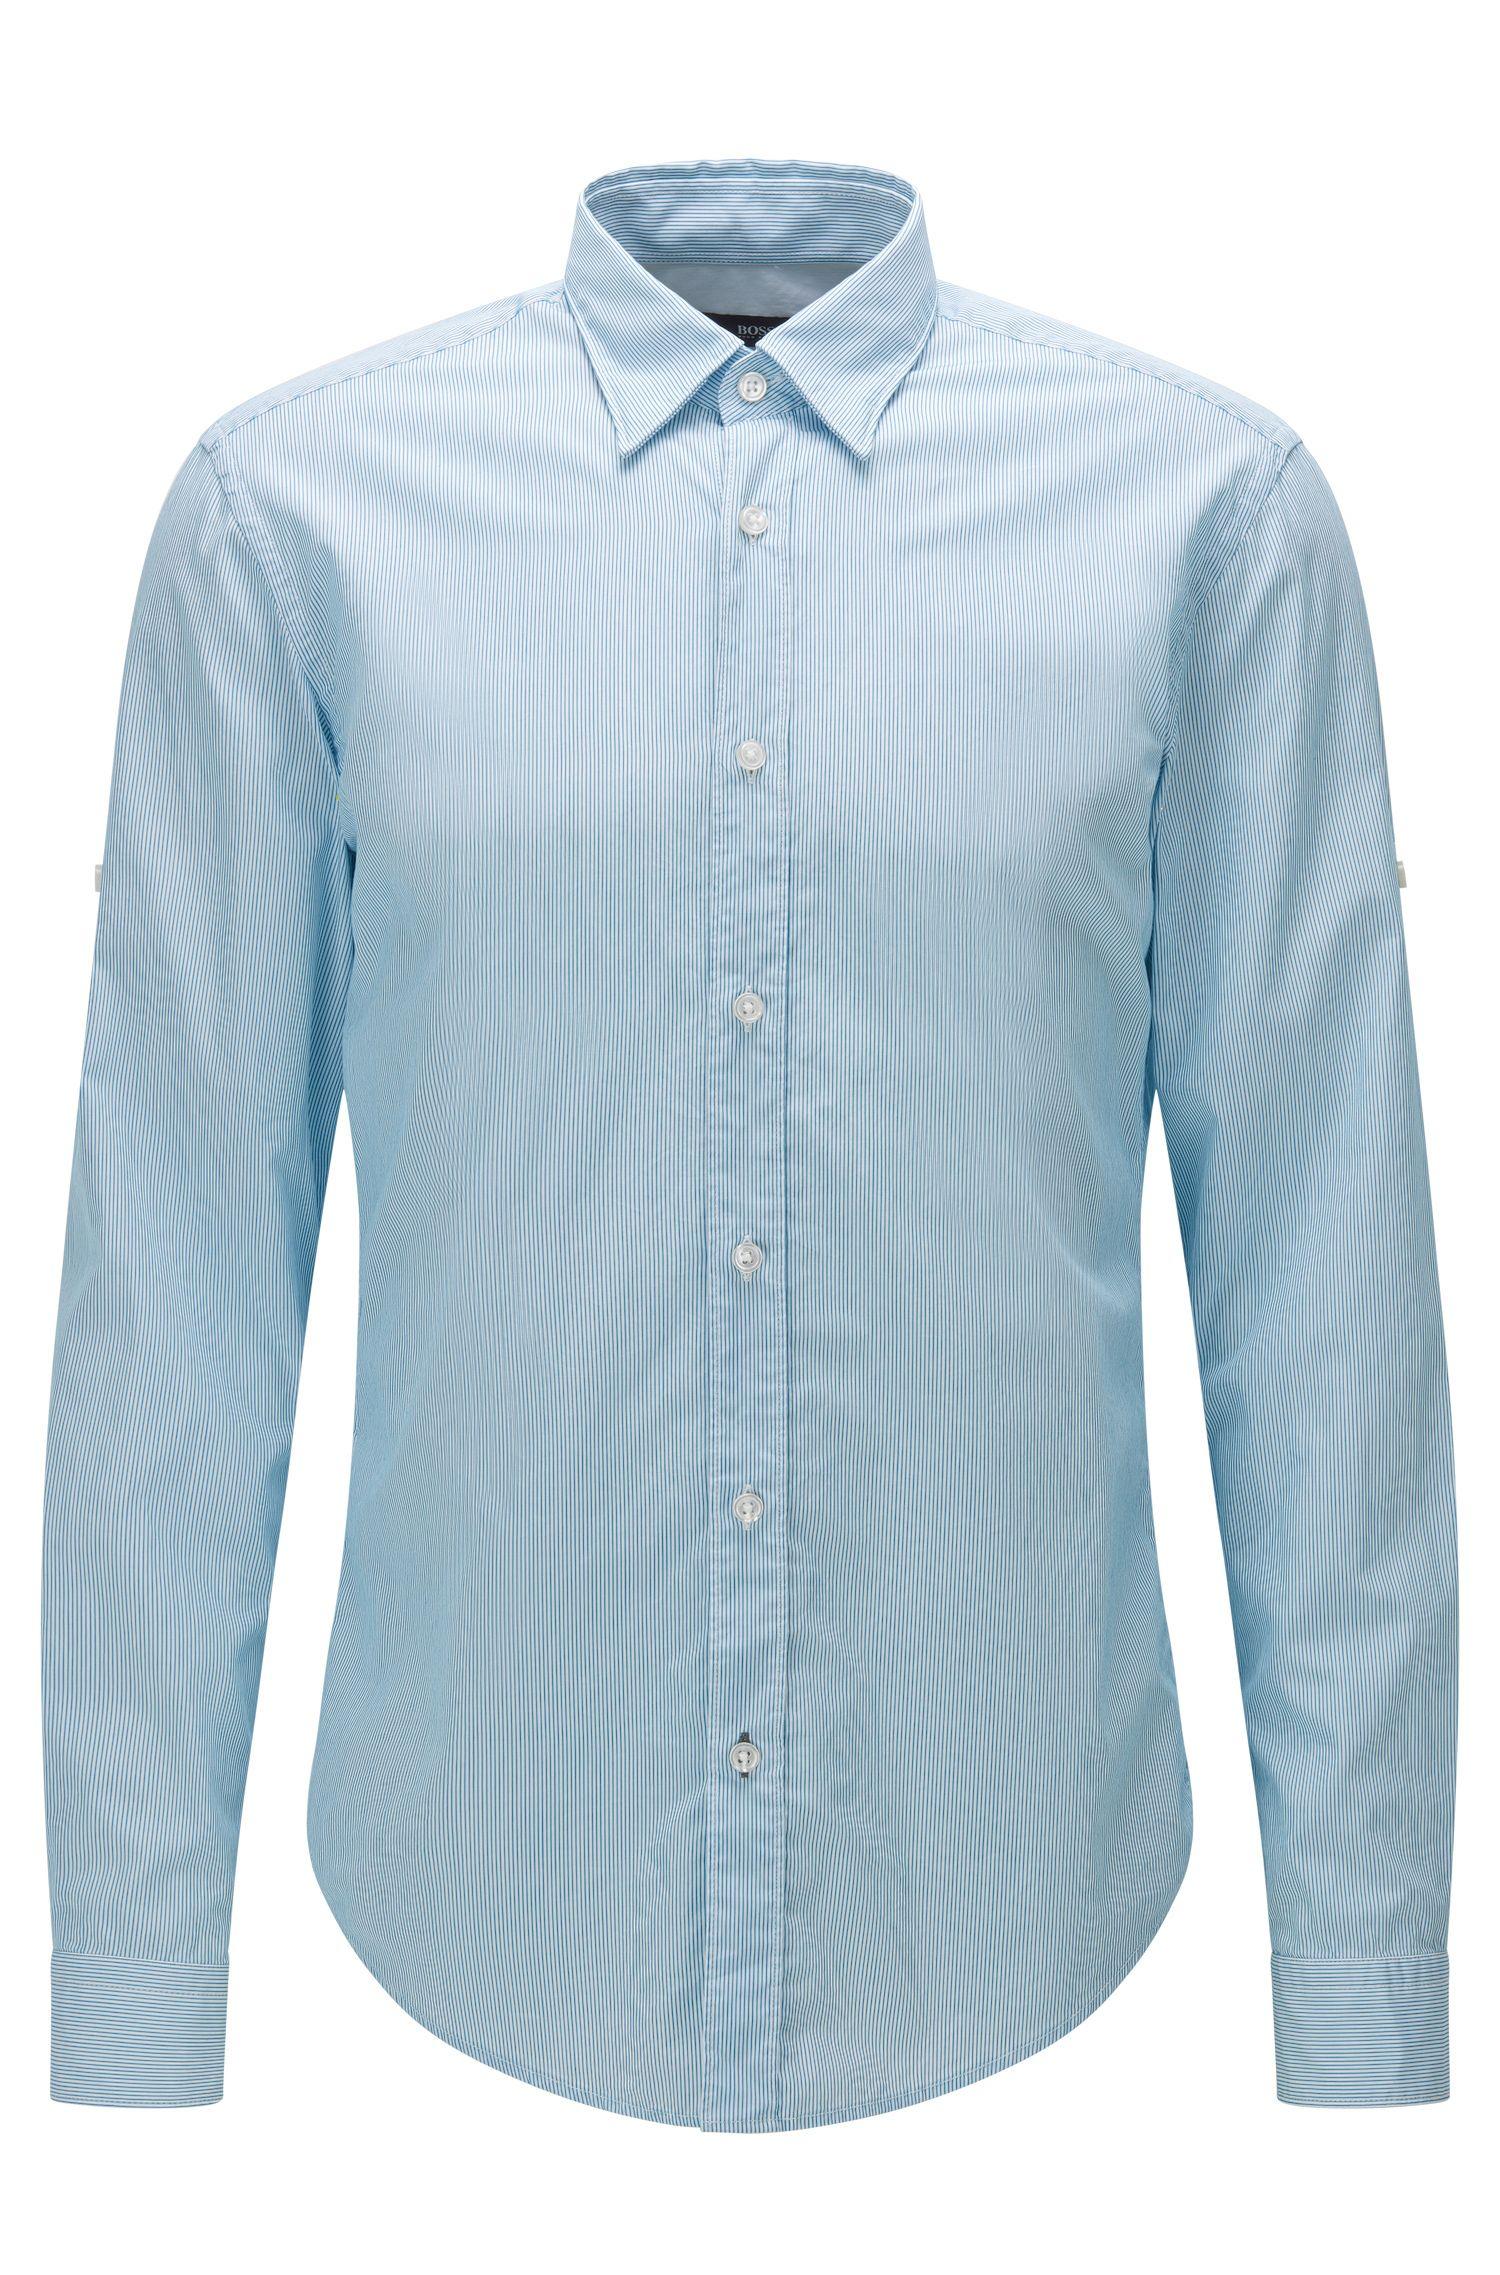 'Rog' | Slim Fit, Striped Cotton Button Down Shirt